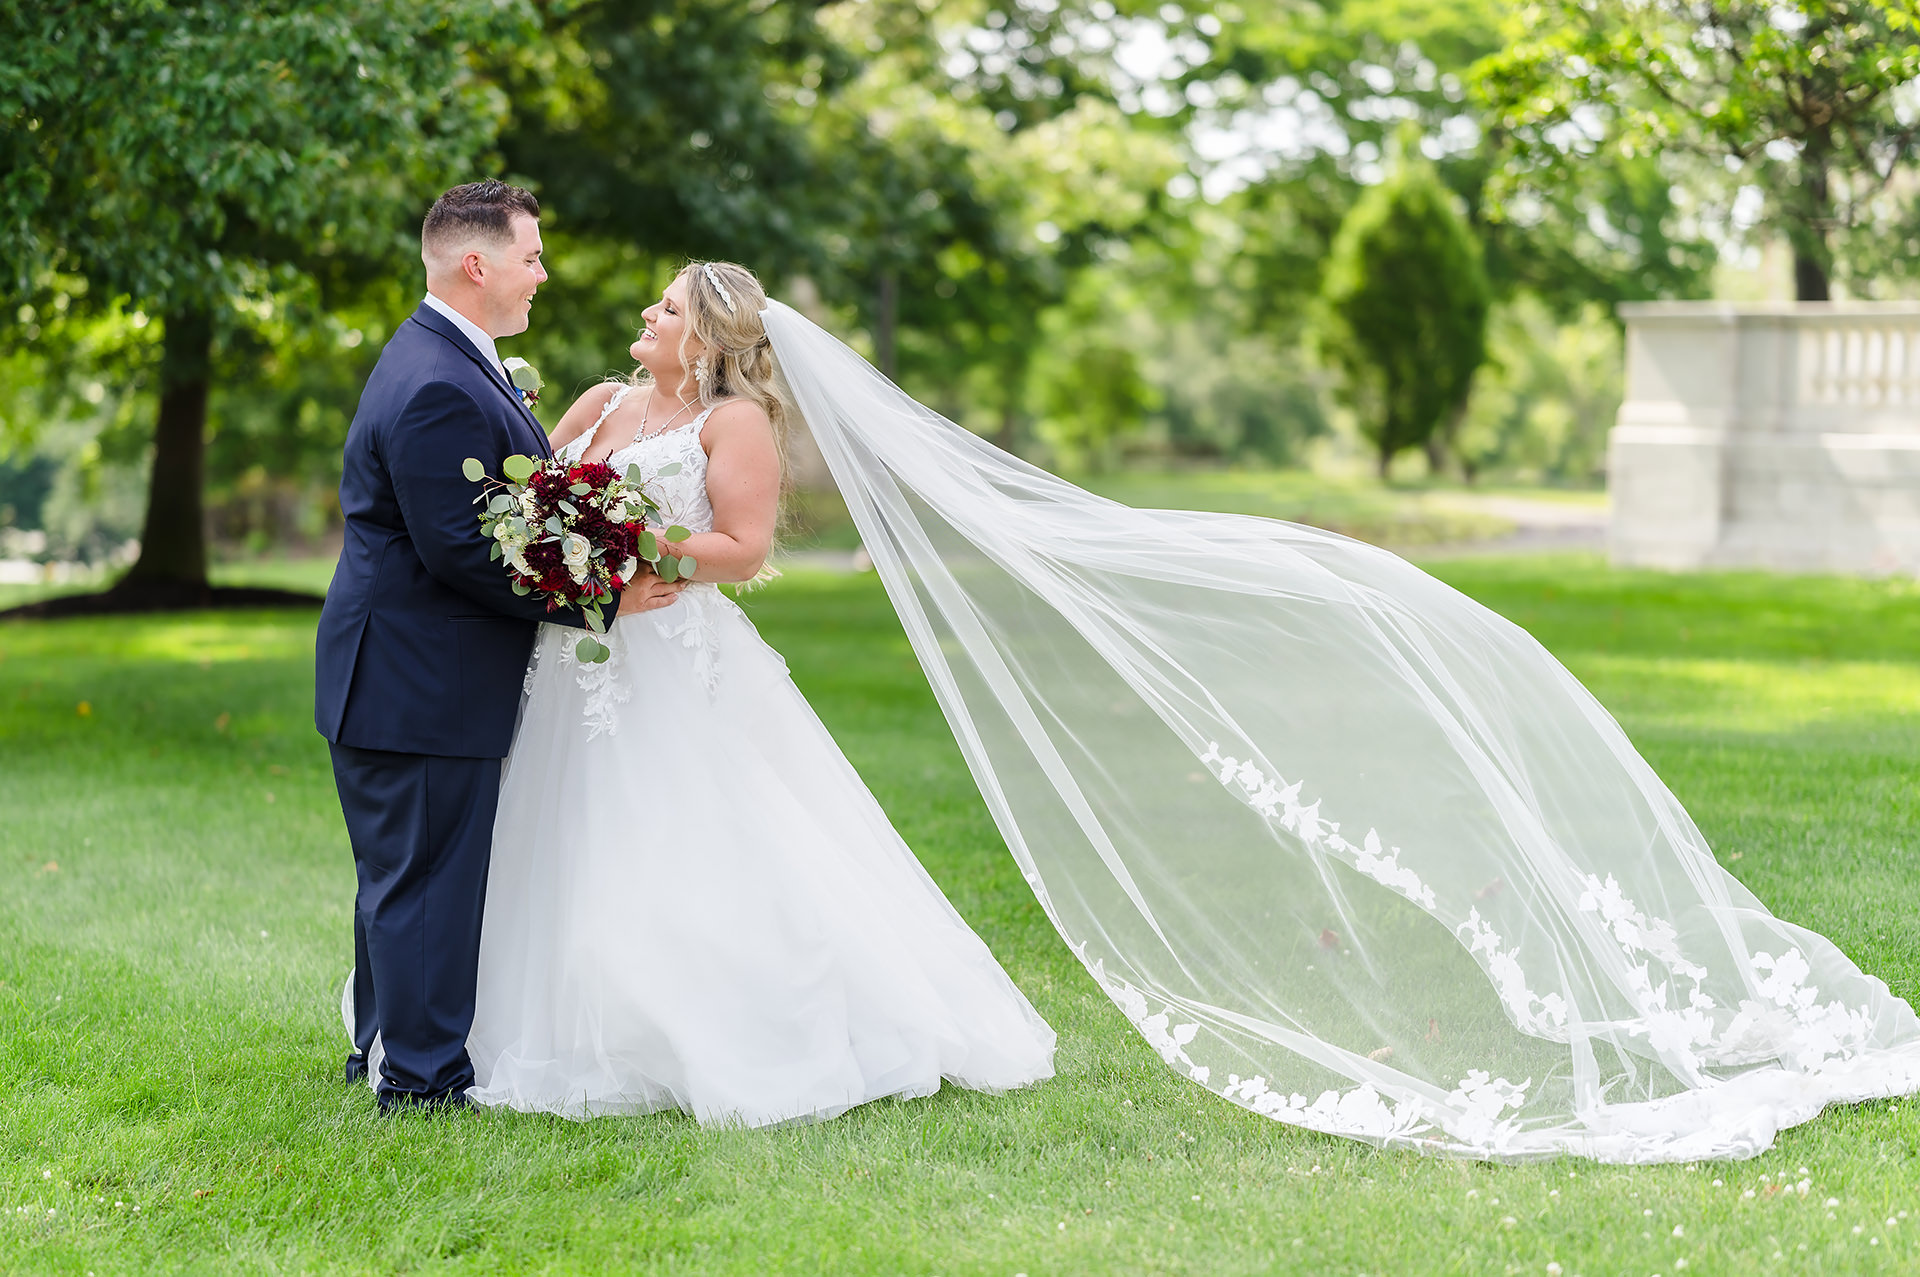 Parma Wedding at Shynok – Pokrova Ukrainian Church Wedding